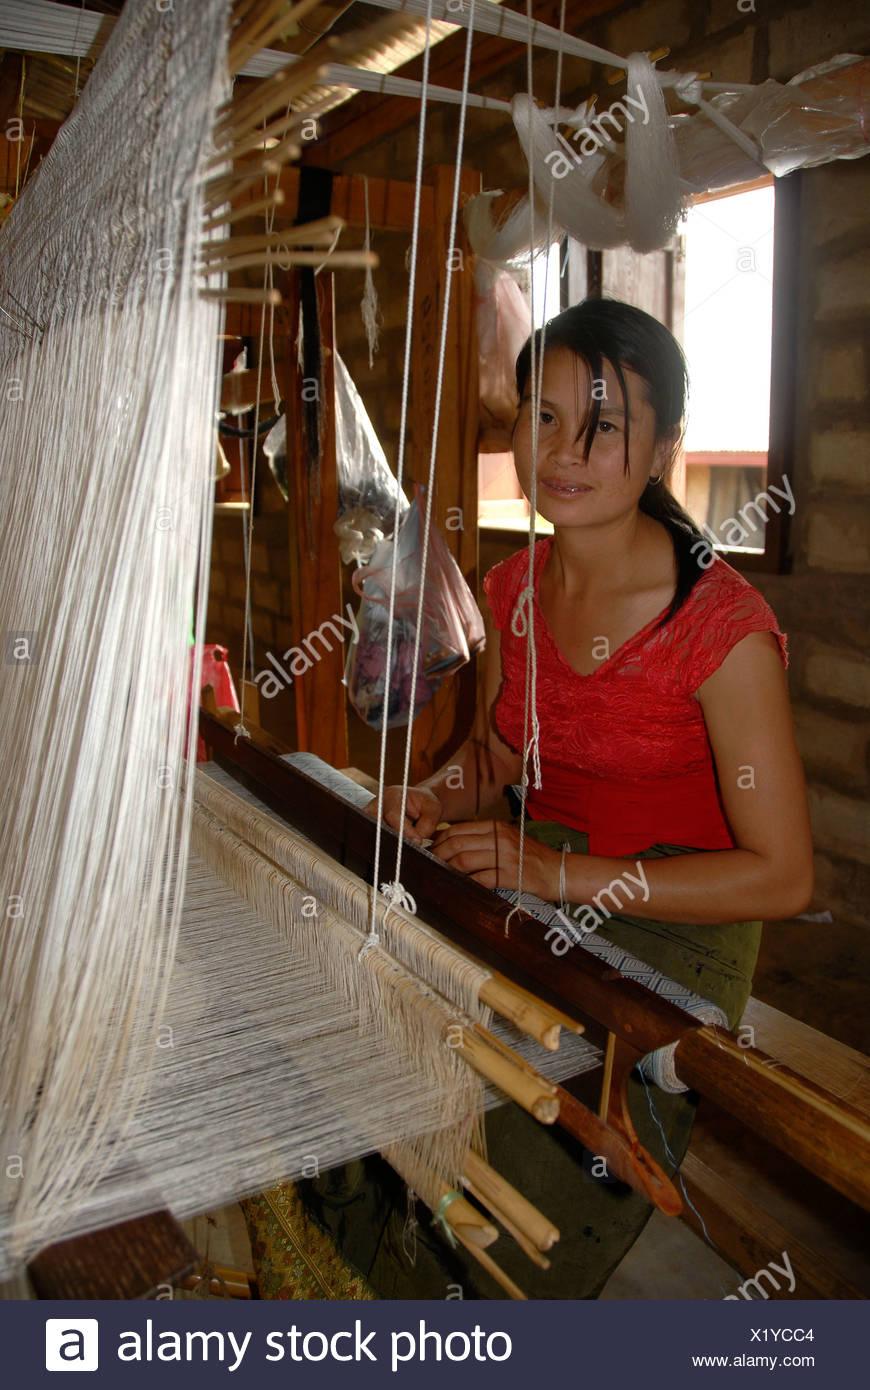 Artesanía, joven tejer en un telar de seda, Phonsavan, provincia de Xieng Khuang, Laos, Sudeste de Asia Imagen De Stock